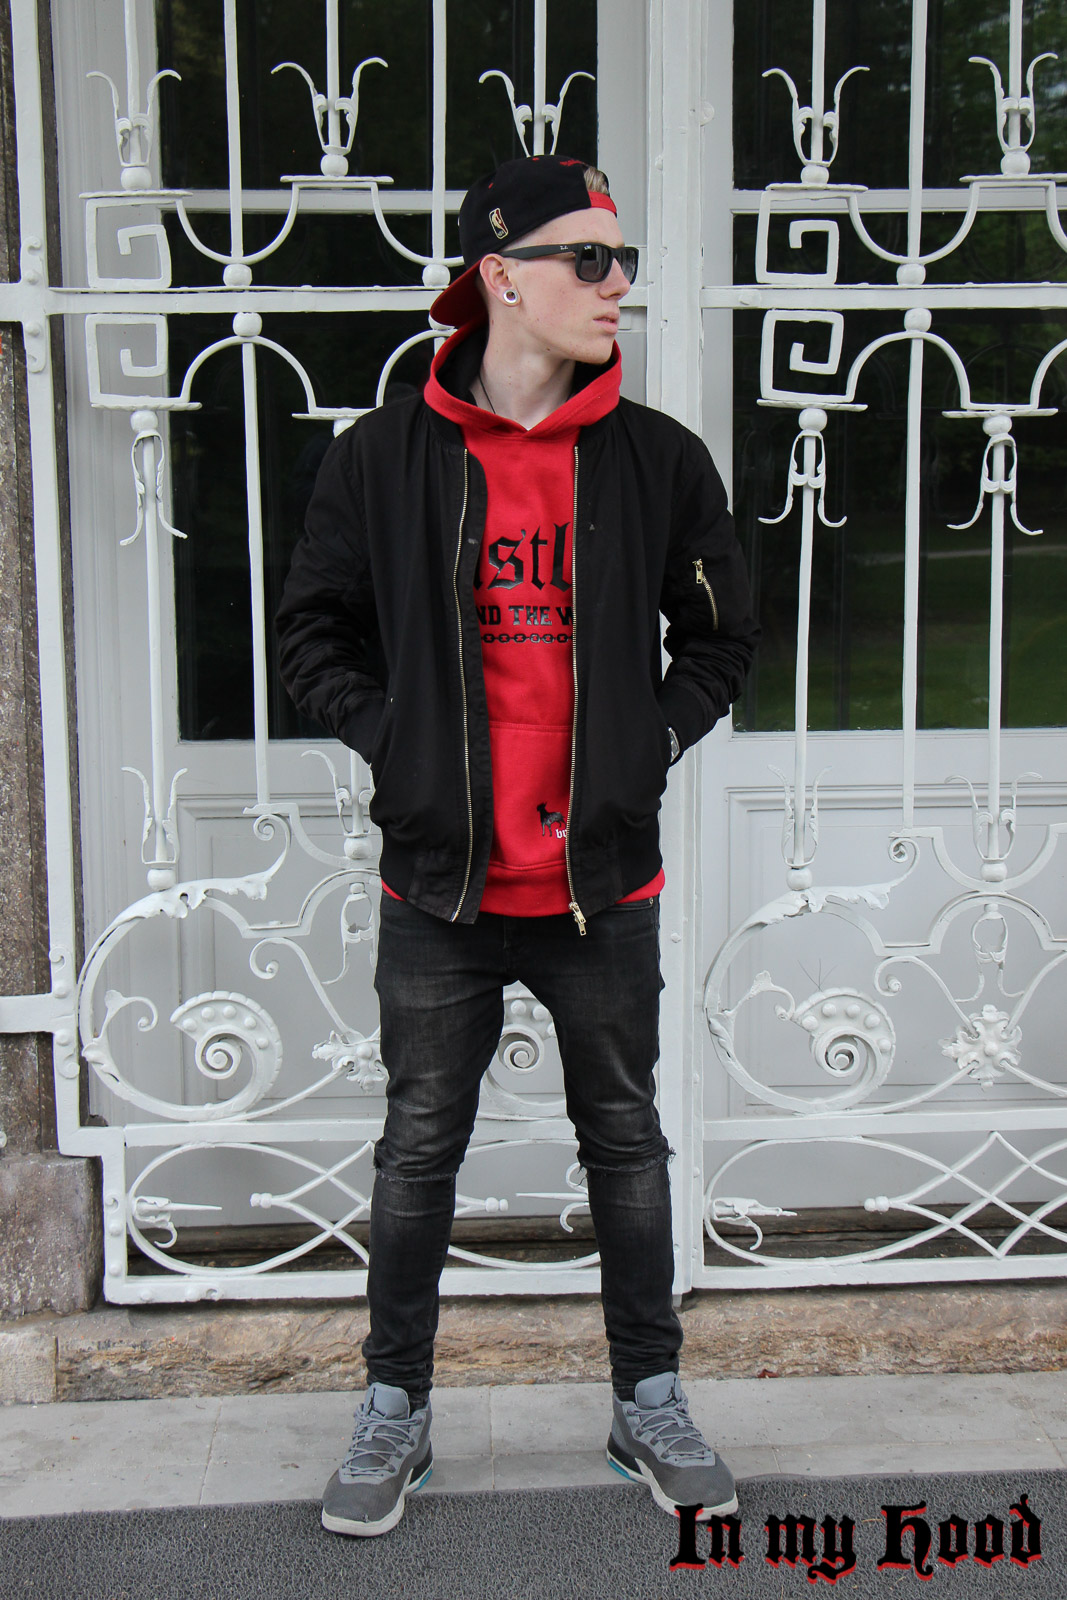 MY STYLE Roter Kapuzenpulli, In my Hood, Tobias, Austria, Steiermark, Graz, Grazer Blogger, OOTD, WIW, What I wore, Instastyle, Style is what , Streetstyle, Fashionaddict, Mensfashion, Mensstyle, Men with style, Fashiongoals, Fashionkilla, styled, Styleguide, Fashionblogger, Styleblogger, Lifestyleblog, Lifestyleblogger, Bloggerstyle, Bomberjacke, Nike, Knee-Cut Jeans, Ray Ban, roter Kapuzenpulli